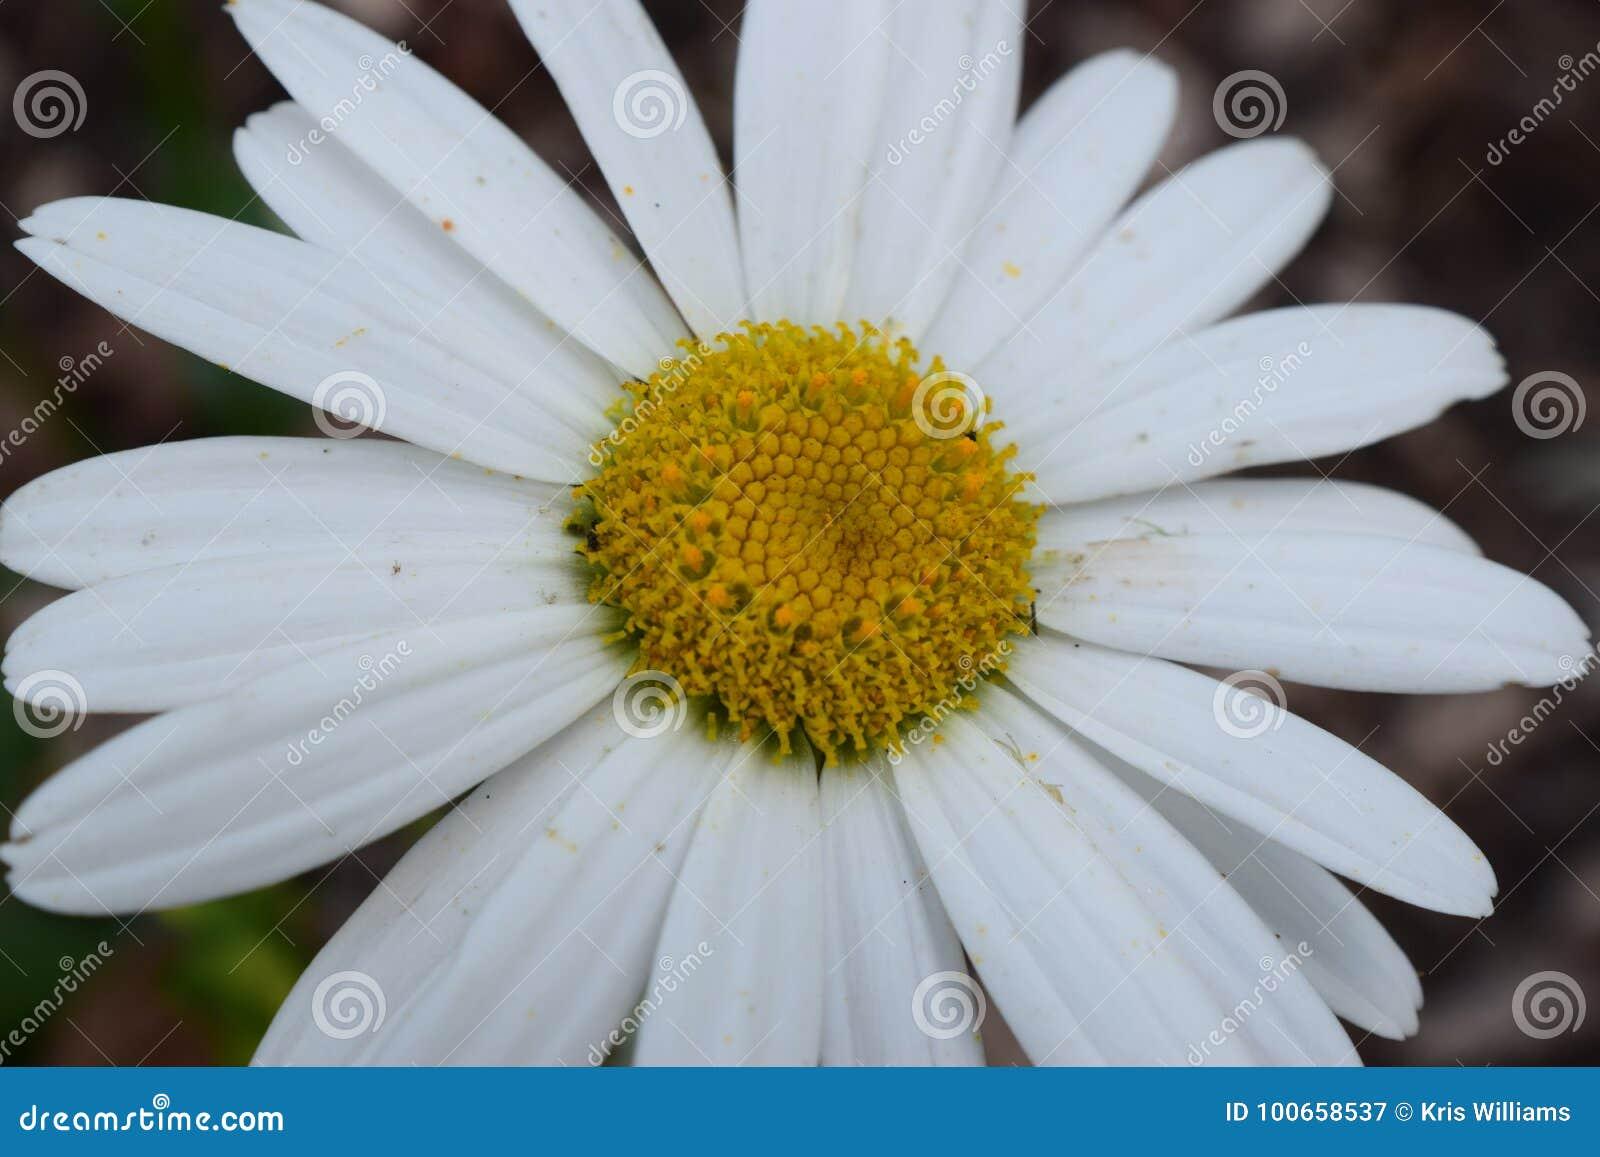 Alaska Shasta Daisy Flower Bloom Stock Image Image Of Colorful